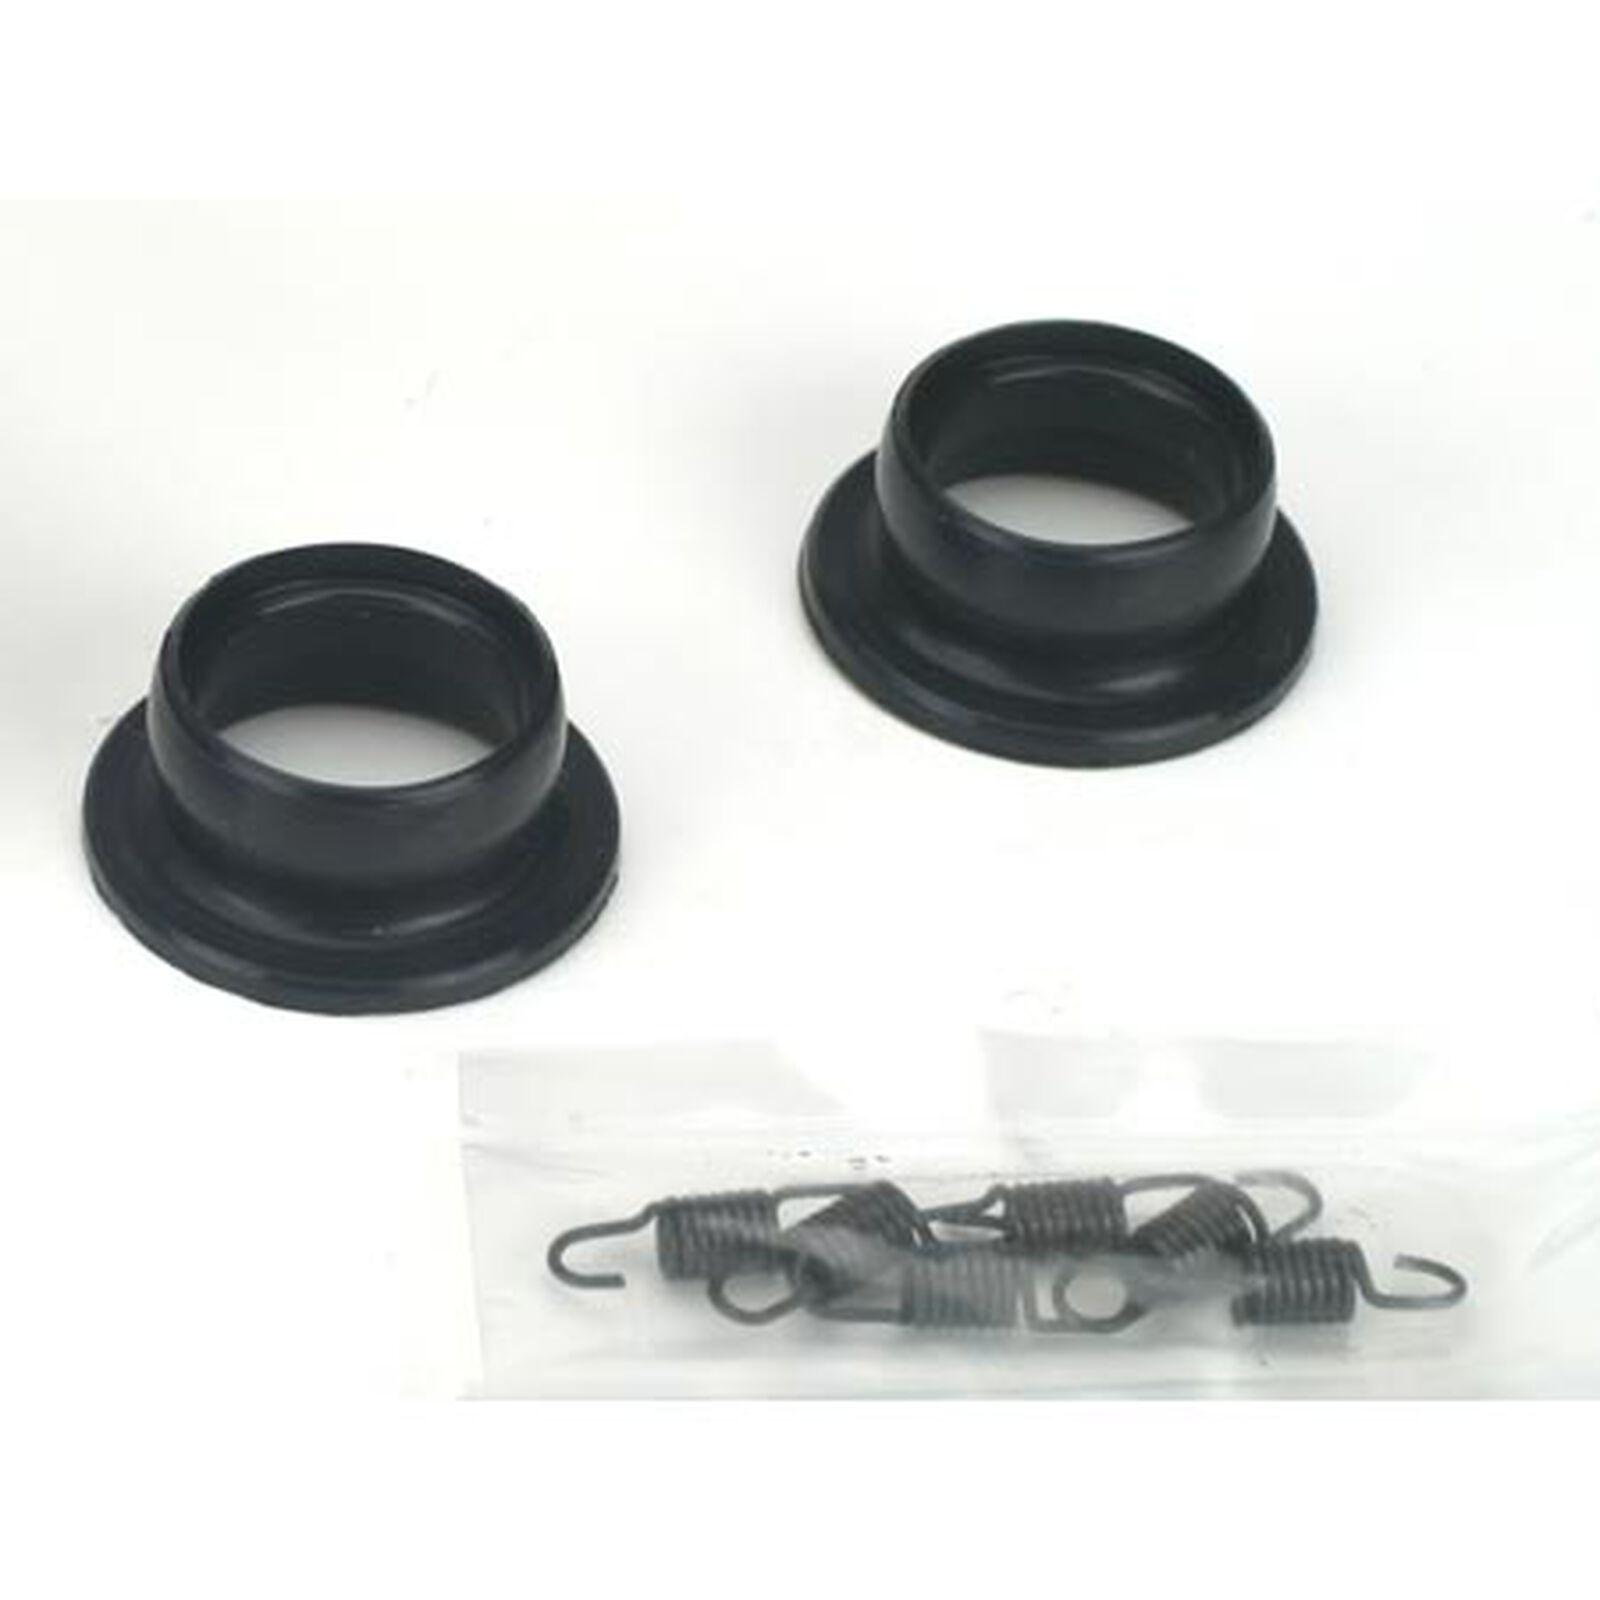 Exhaust Pipe Seals & Spring: LST, LST2, AFT, MUG, MGB, XXL/2